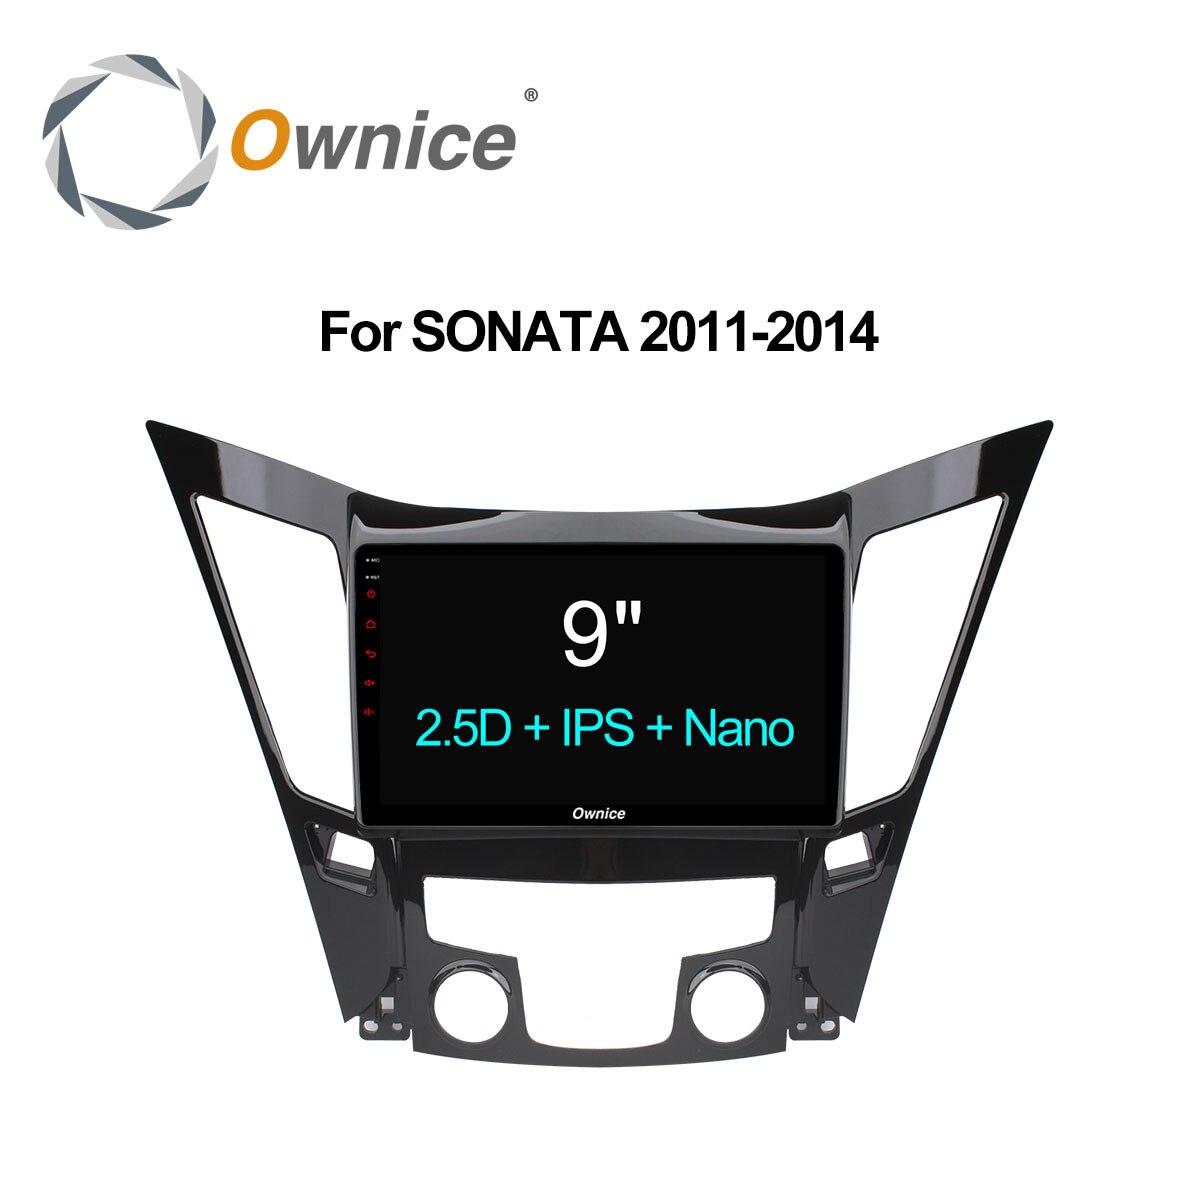 Ownice 9 Octa core 2 г + 32 г dvd-плеер Радио головного устройства Стерео для Hyundai Sonata 2011 -2014 аудио Android GPS Navi 4 г LTE